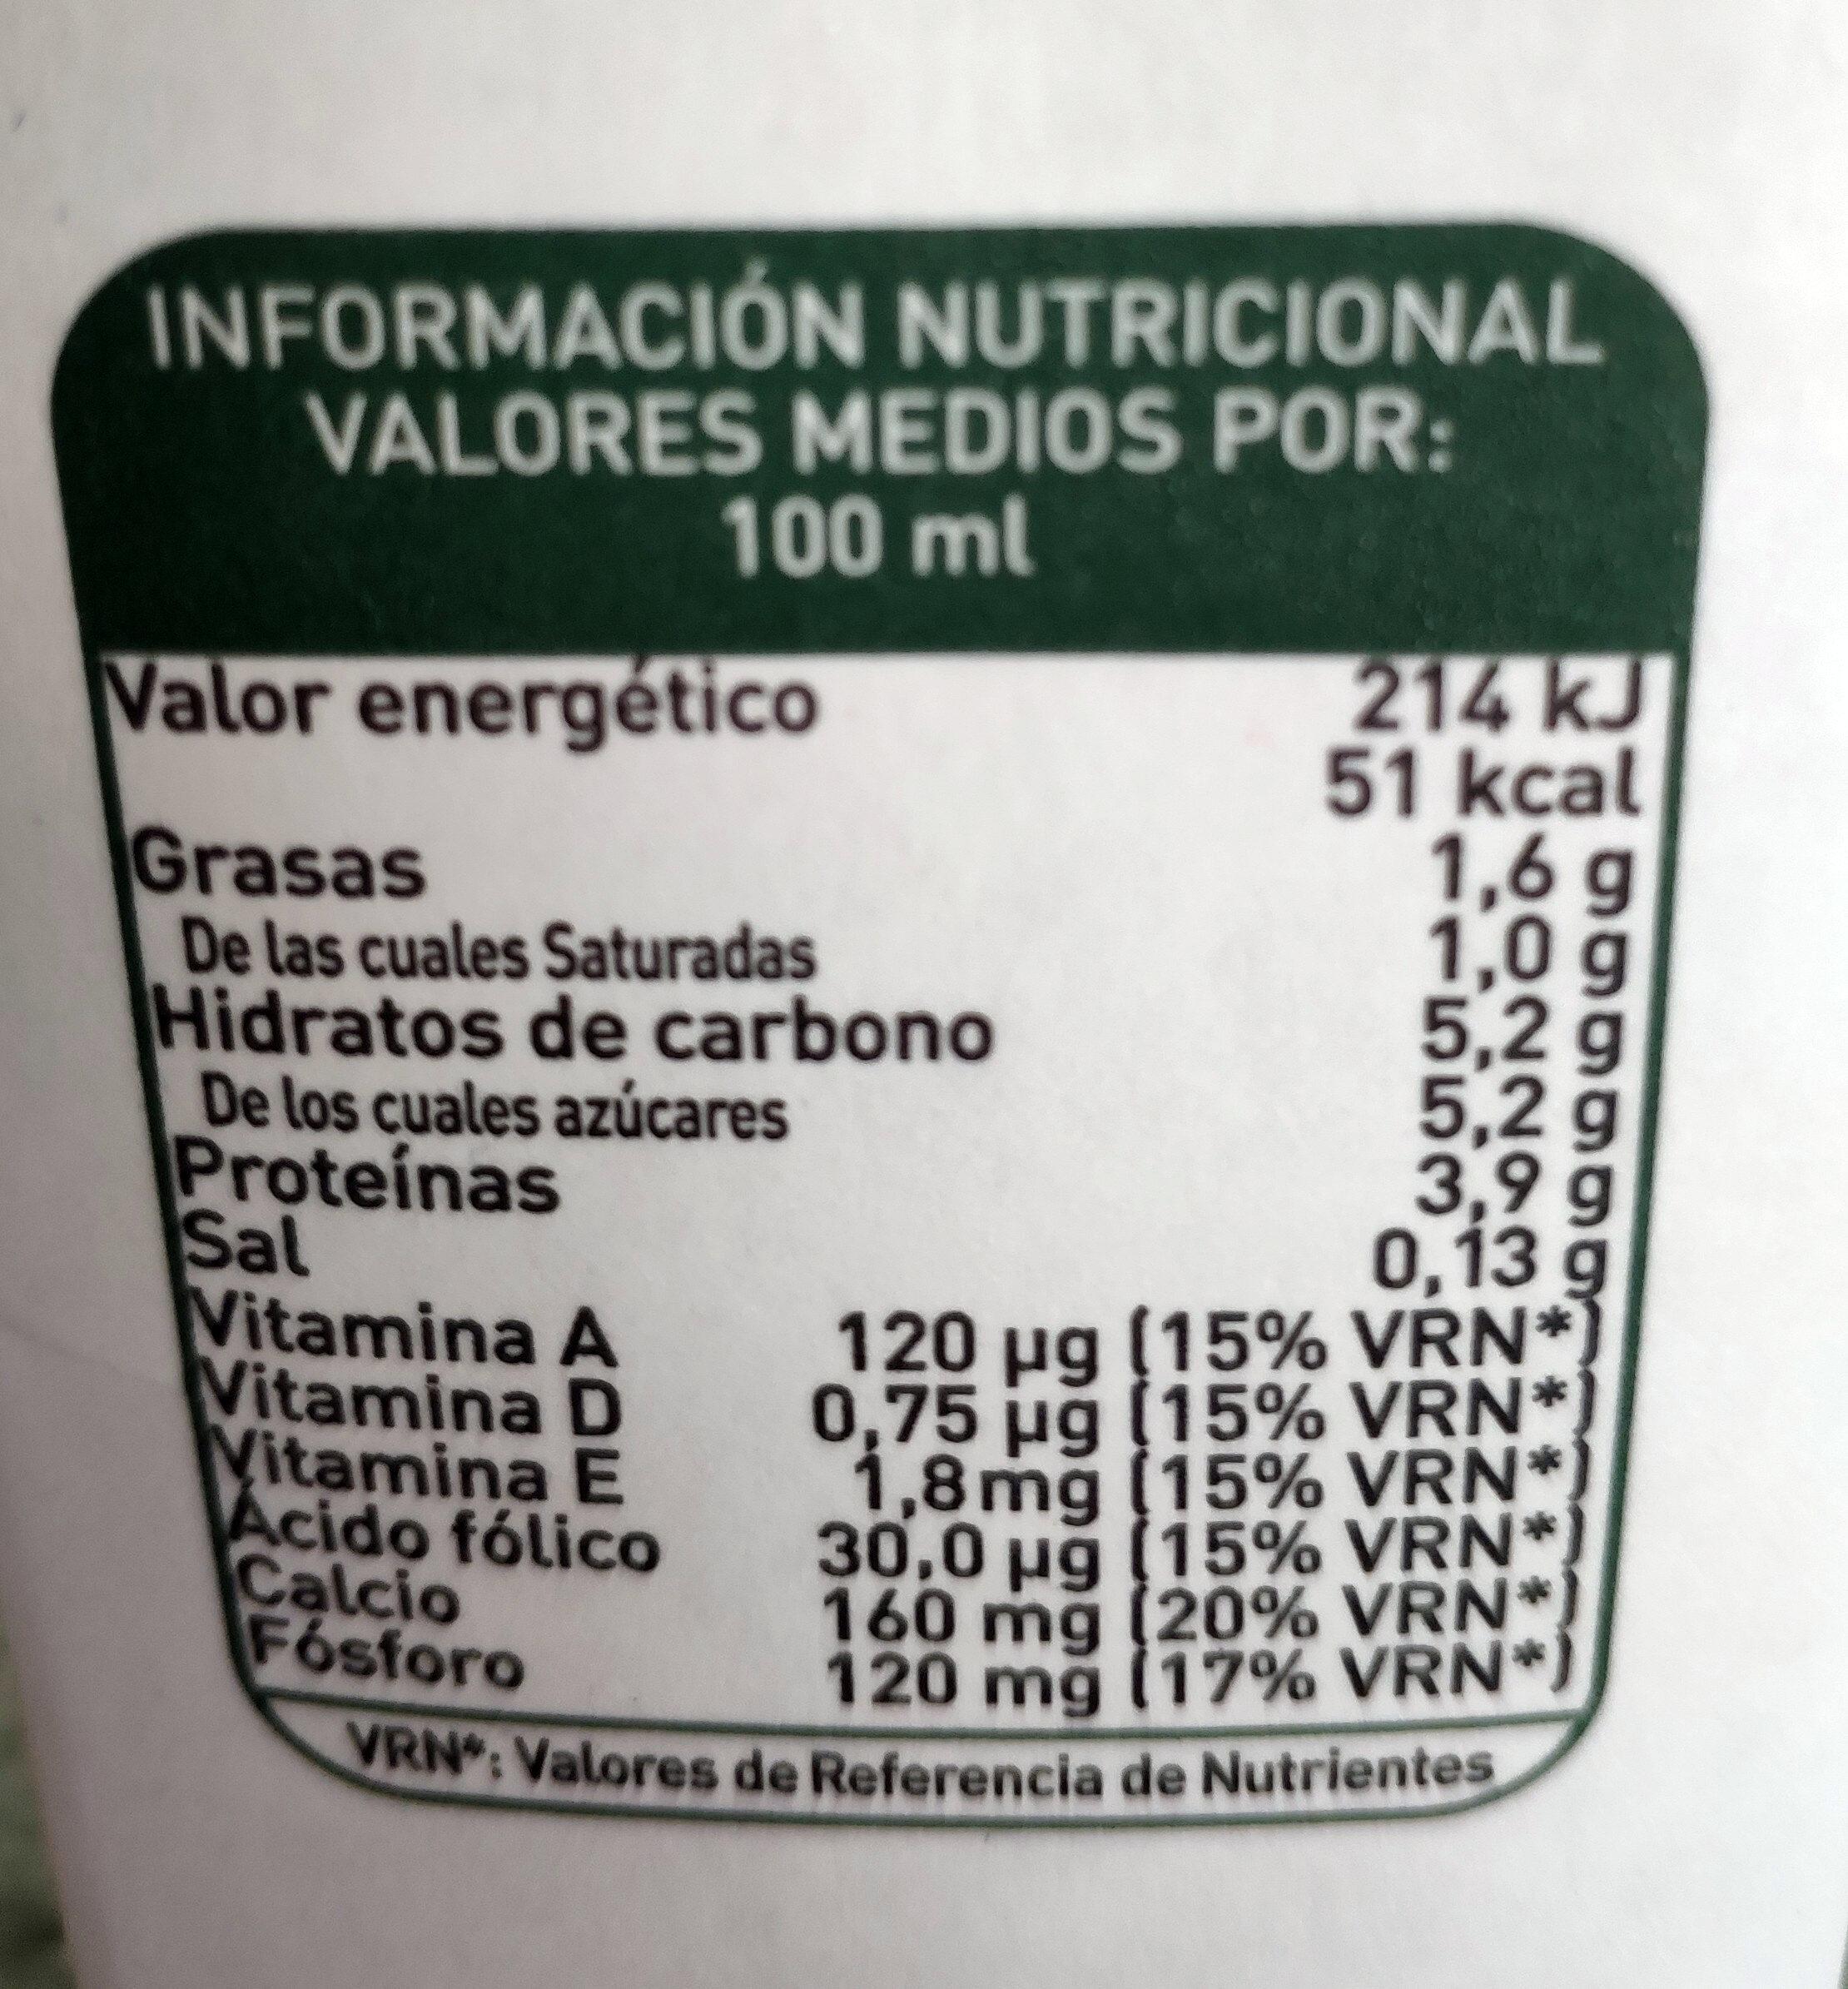 Leche semidesnatada enriquecida con calcio 100% natural - Informations nutritionnelles - es